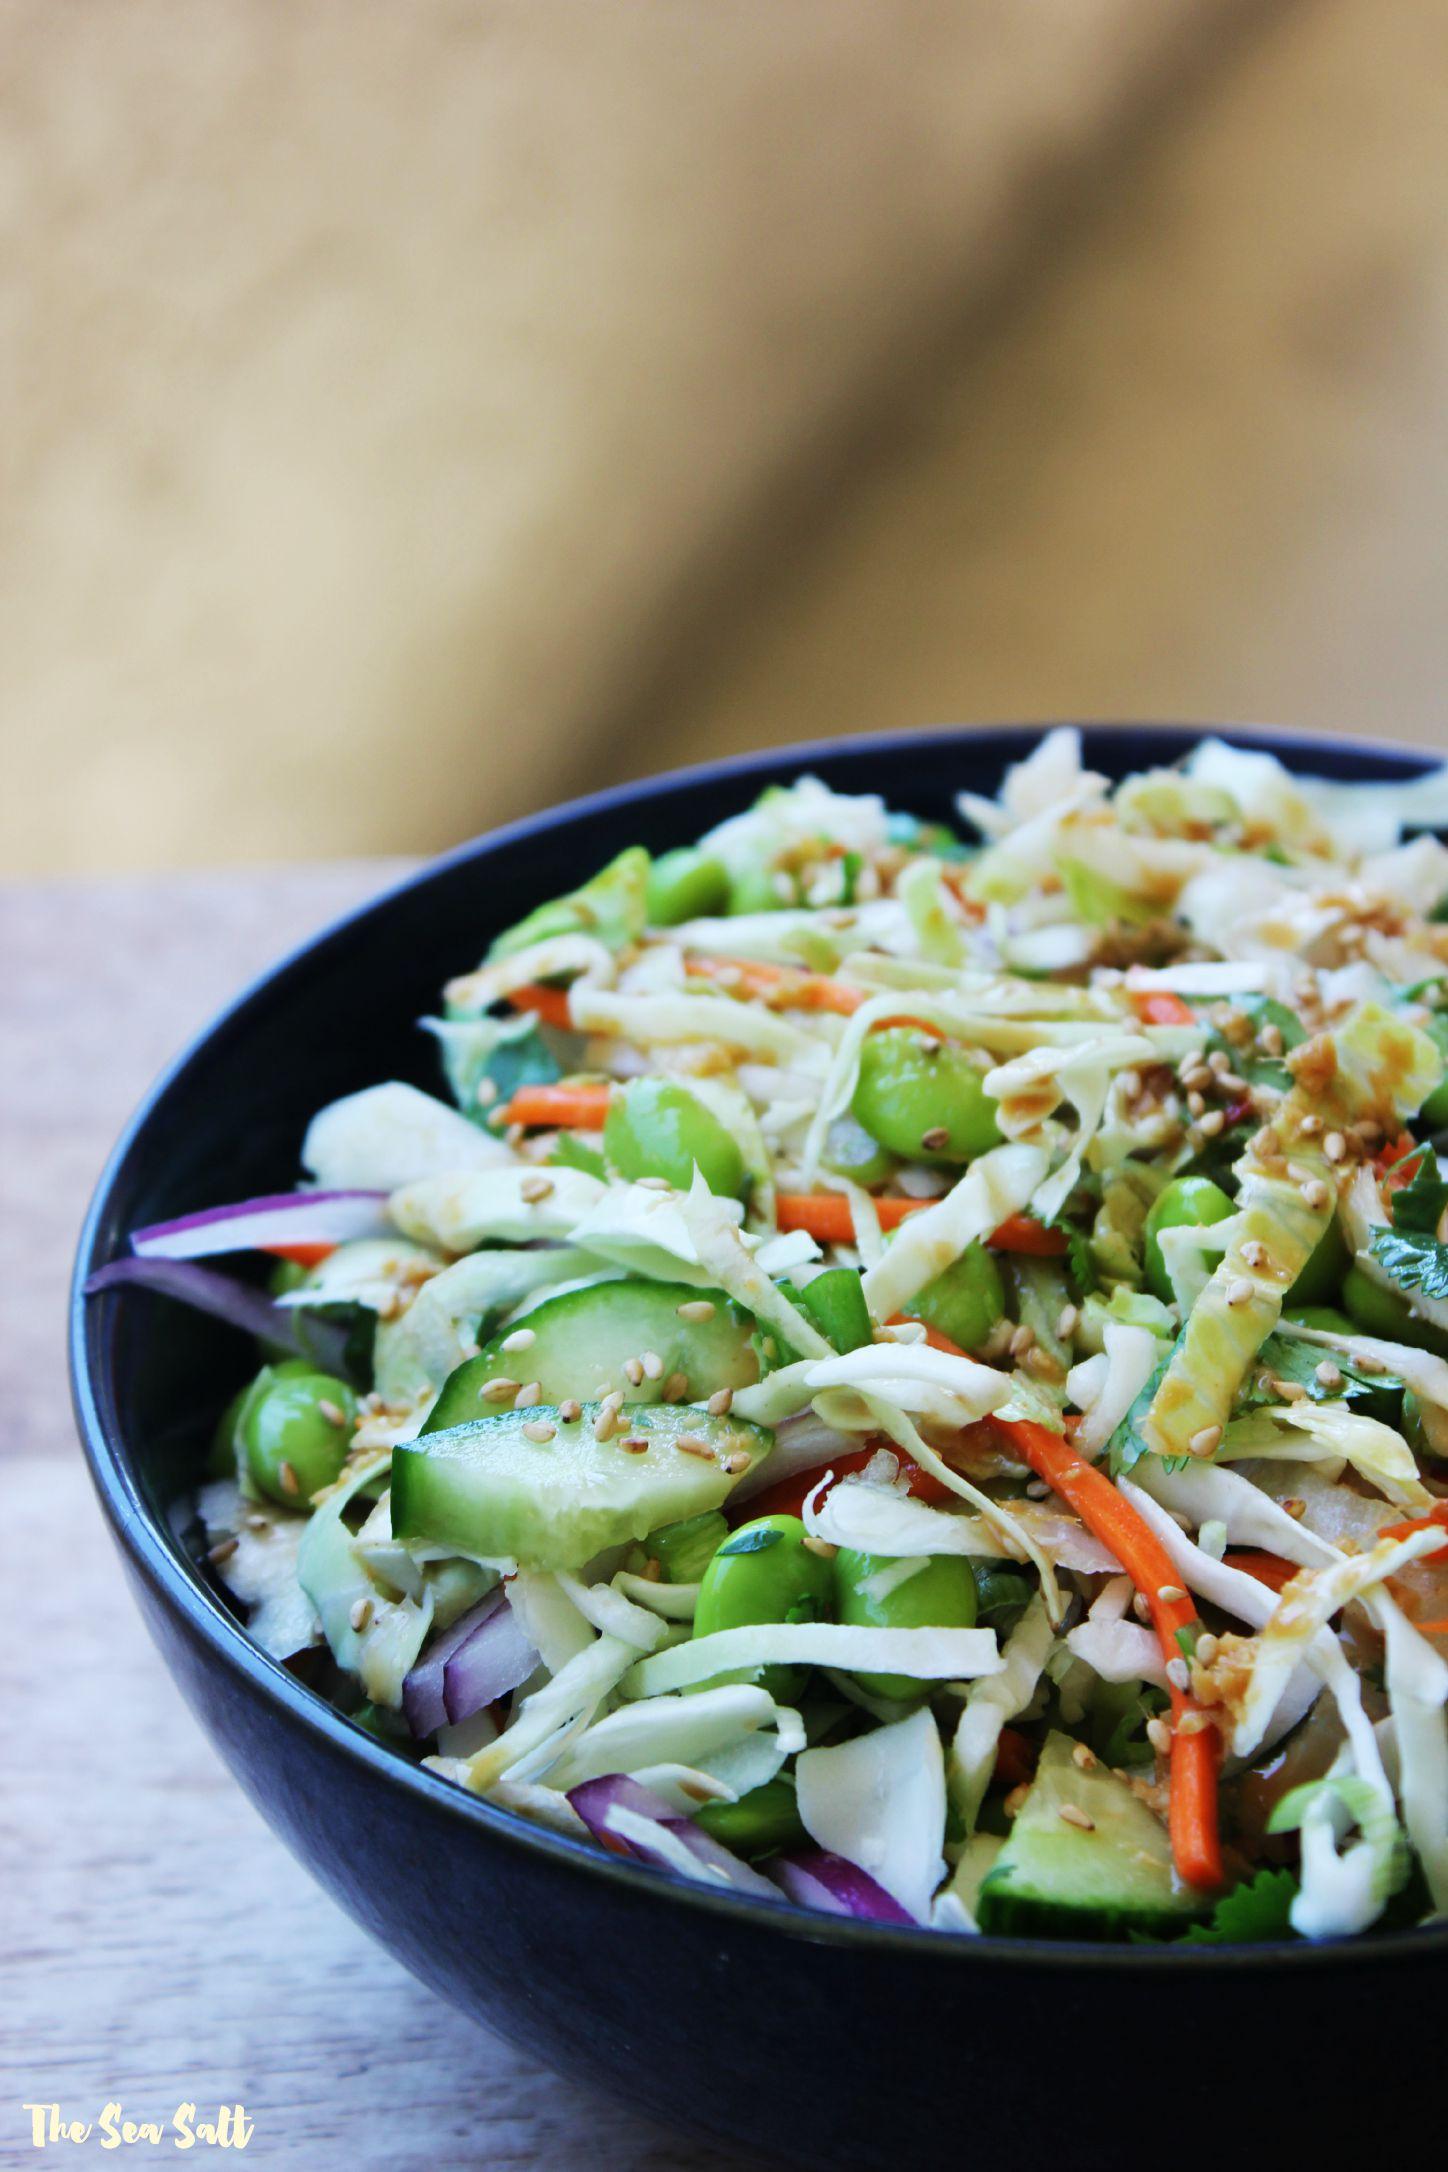 Crunchy Chopped Asian Salad